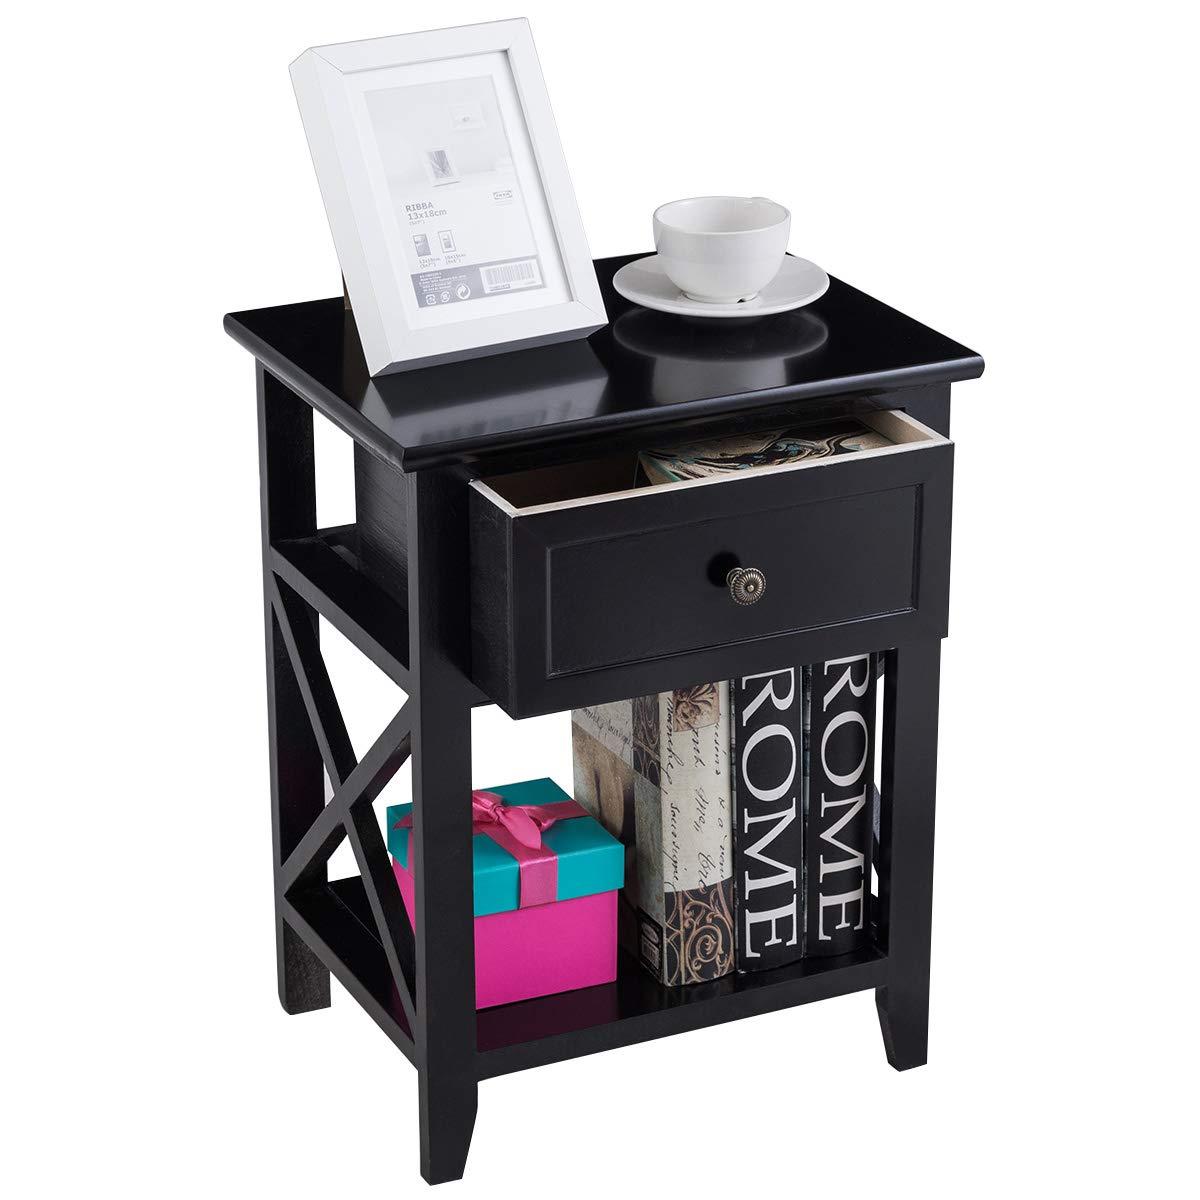 Giantex 2 Pcs Nightstand End Bedside Table Home Bedroom Furniture X-Shape W/Bottom Open Shelf Drawer, Black by Giantex (Image #5)